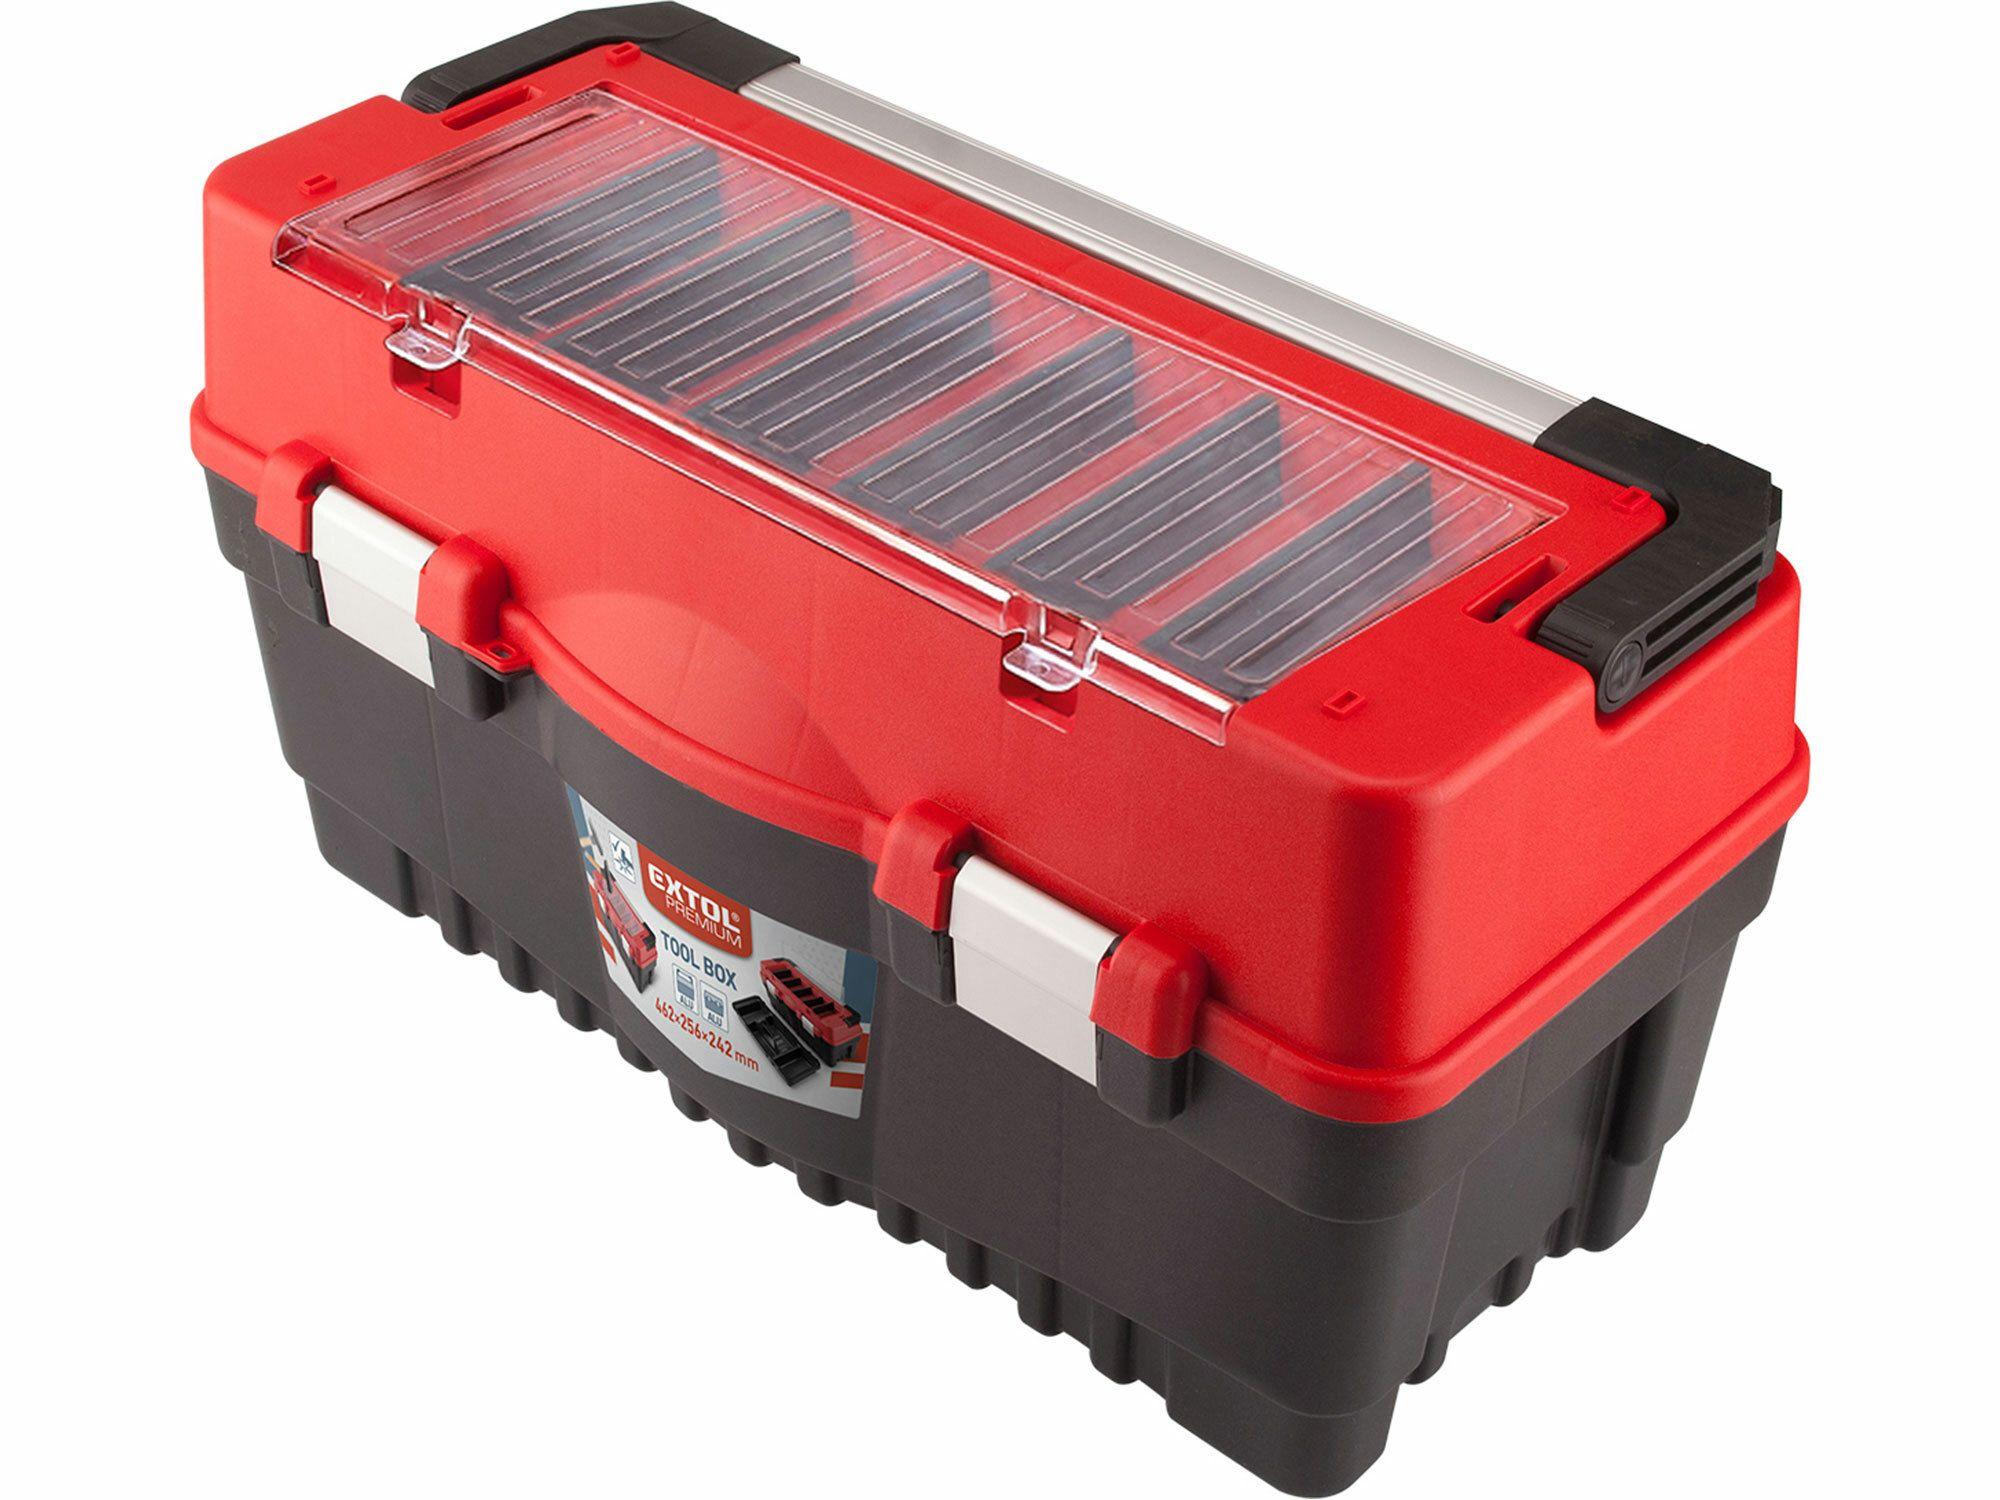 Kufr na nářadí CARBO vel. L, 595x289x328mm EXTOL-PREMIUM